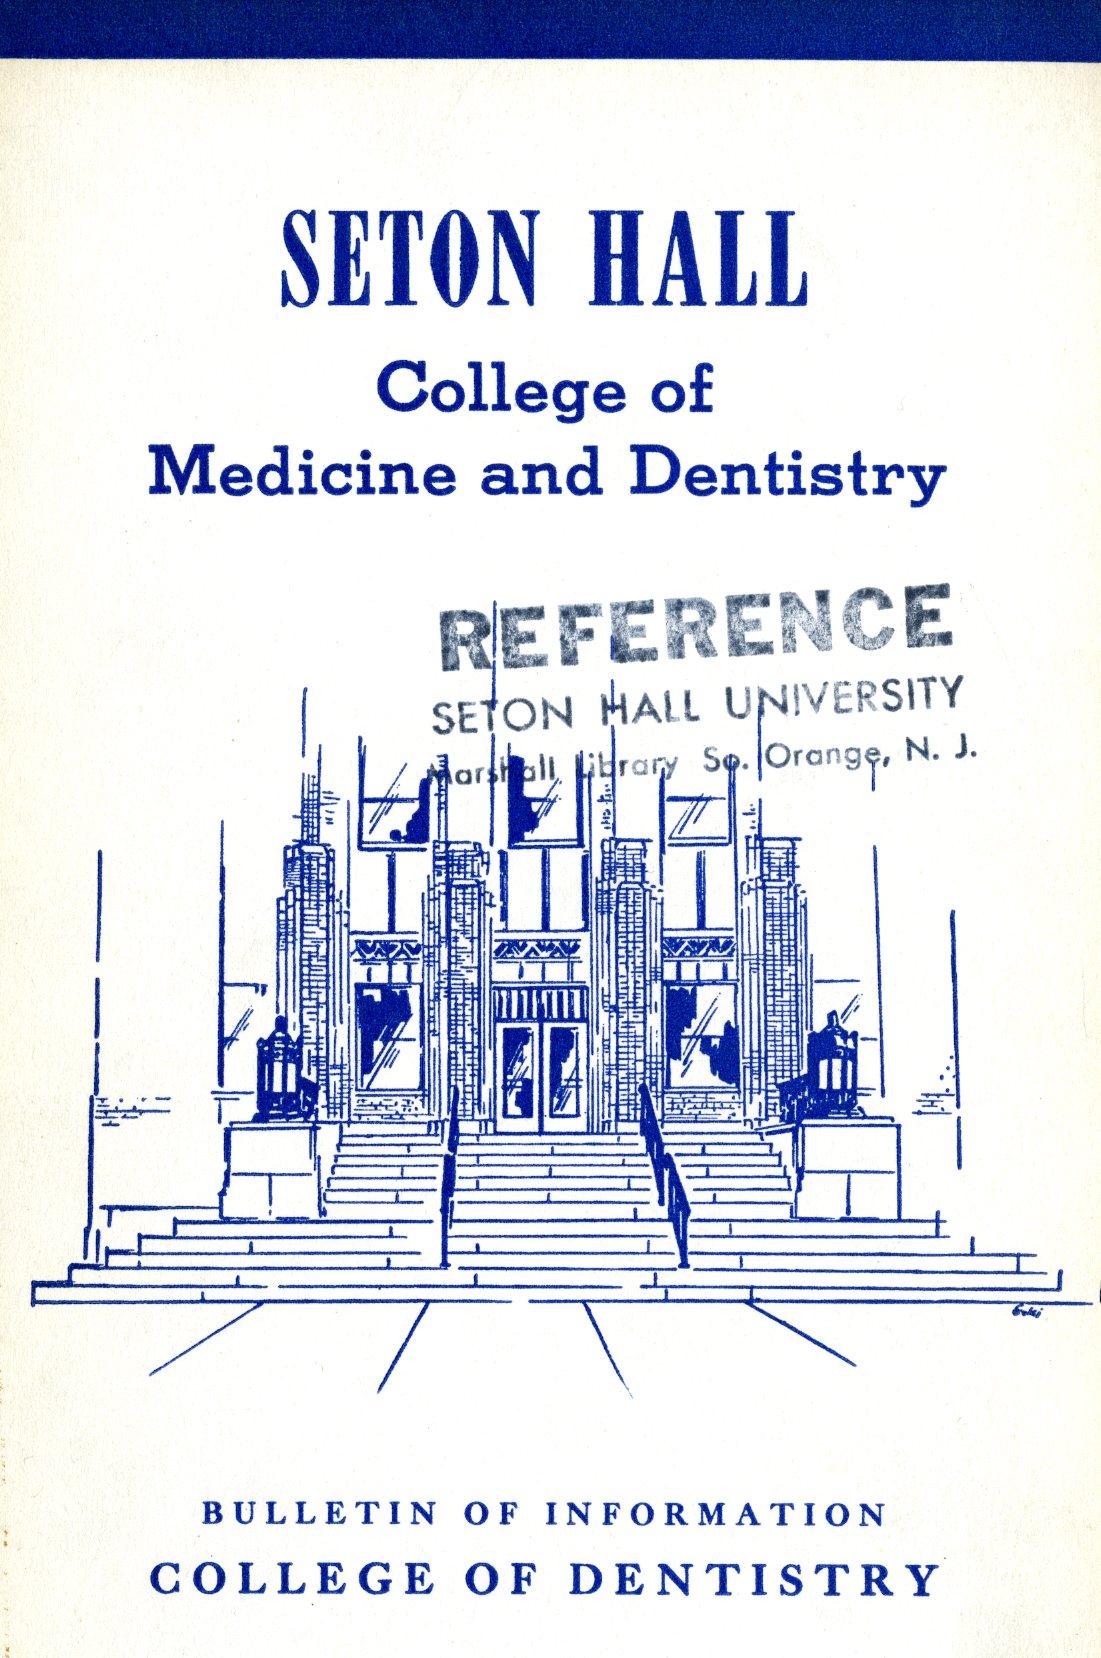 Seton Hall college of medicine and dentistry